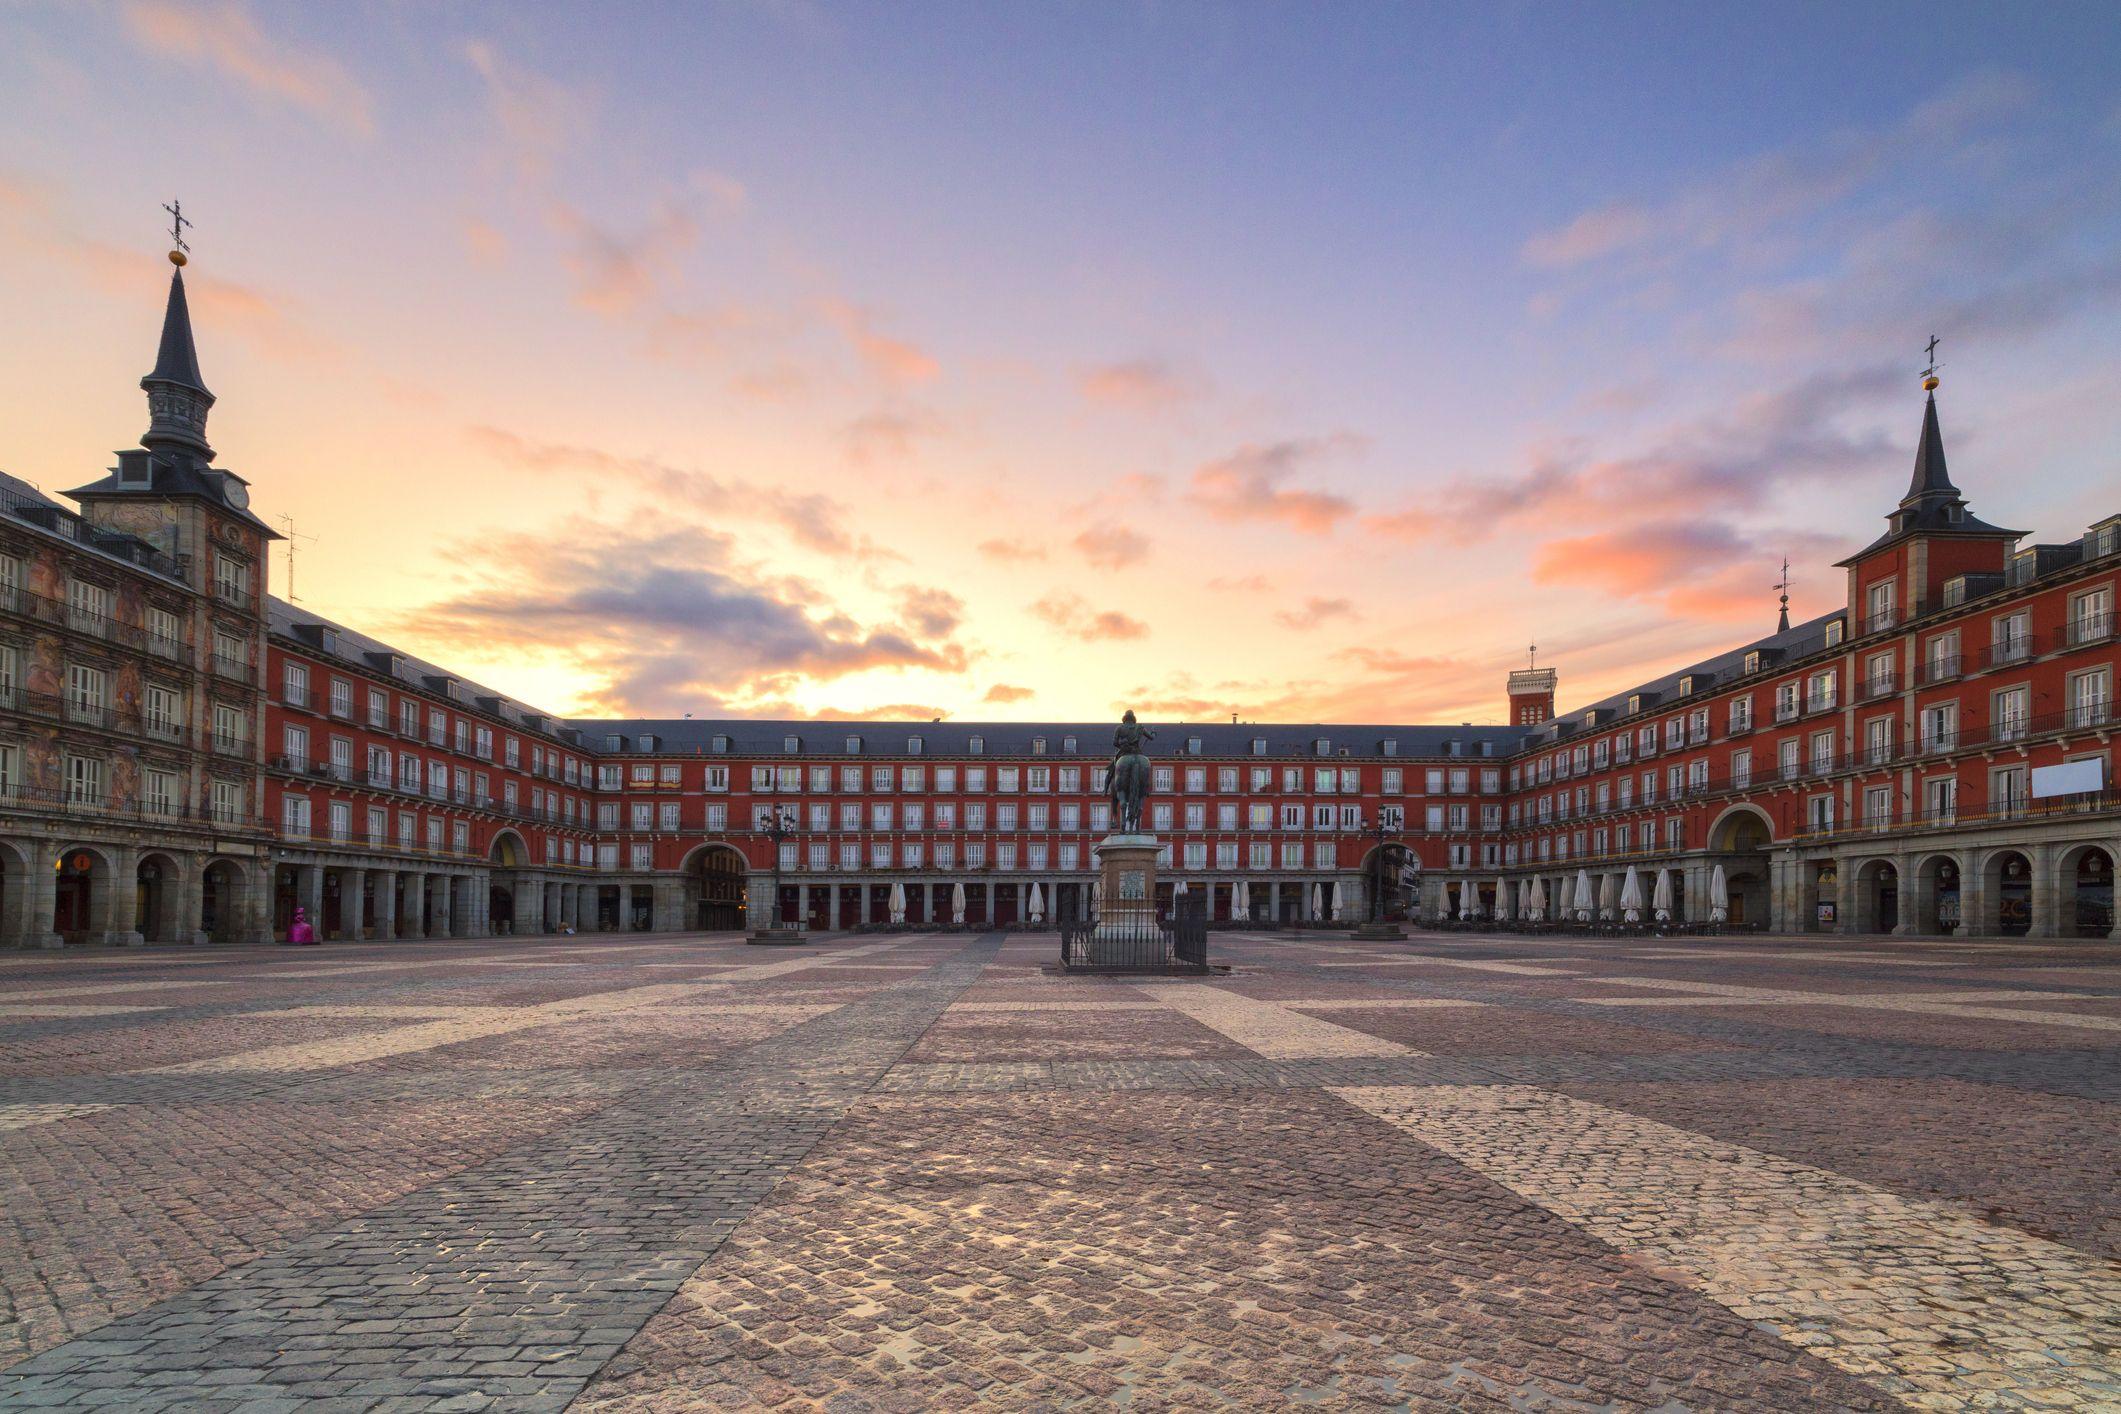 Plaza Mayor at sunrise, Madrid, Spain